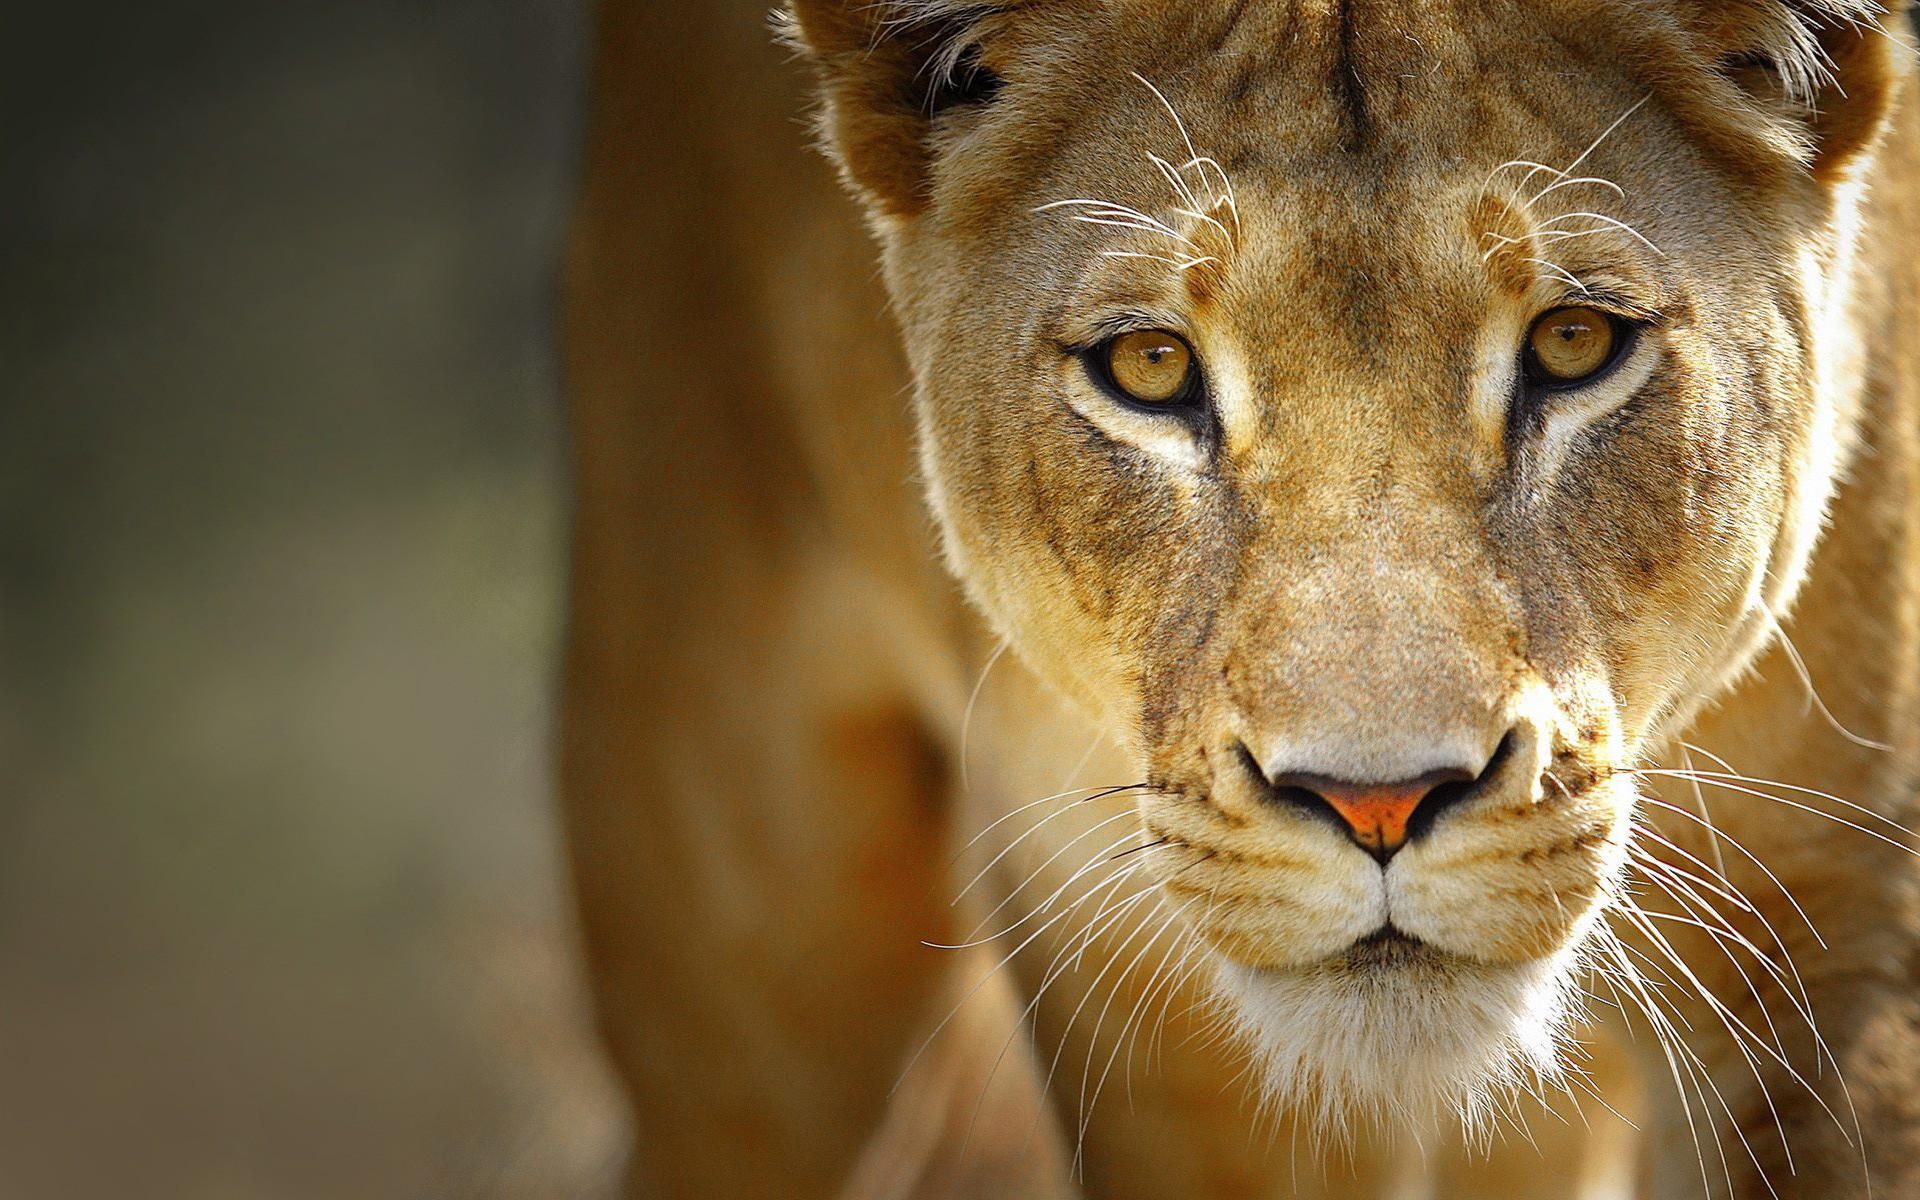 Close Up Nature Animals Lions Fresh New Hd Wallpaper 1920x1200px